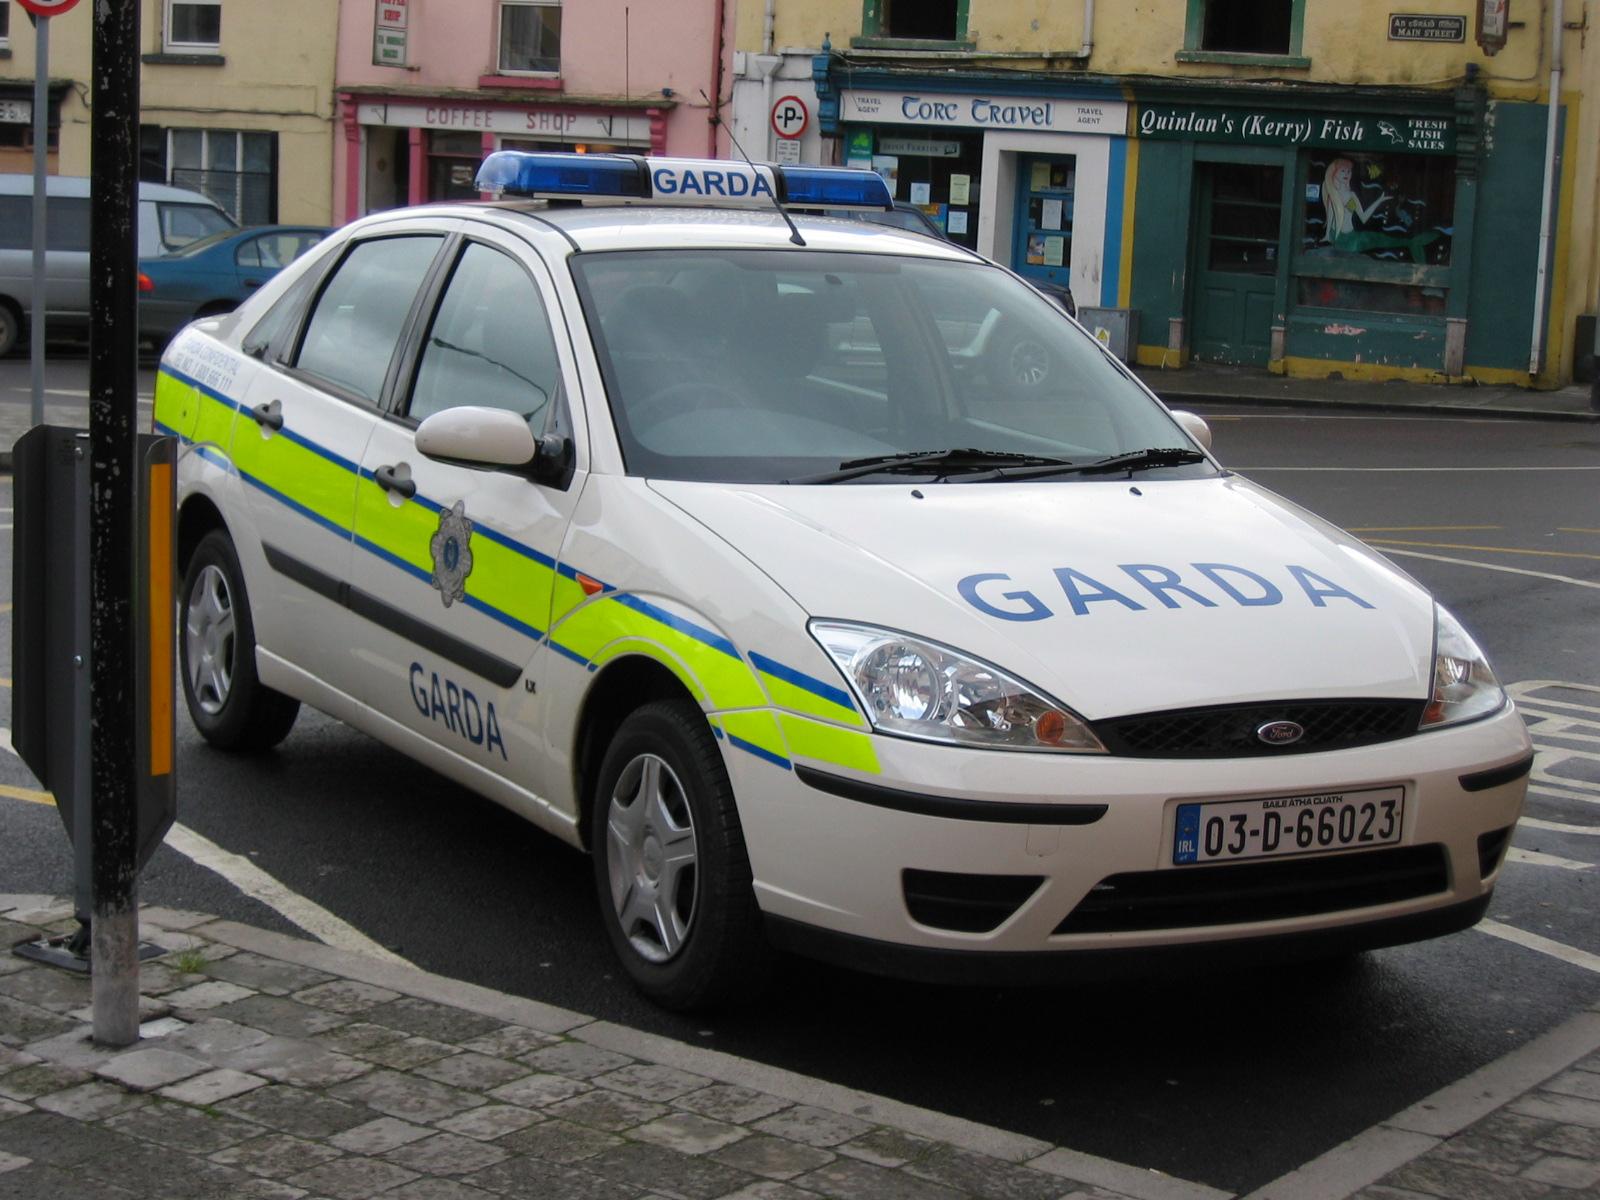 Descrizione Garda car.jpg